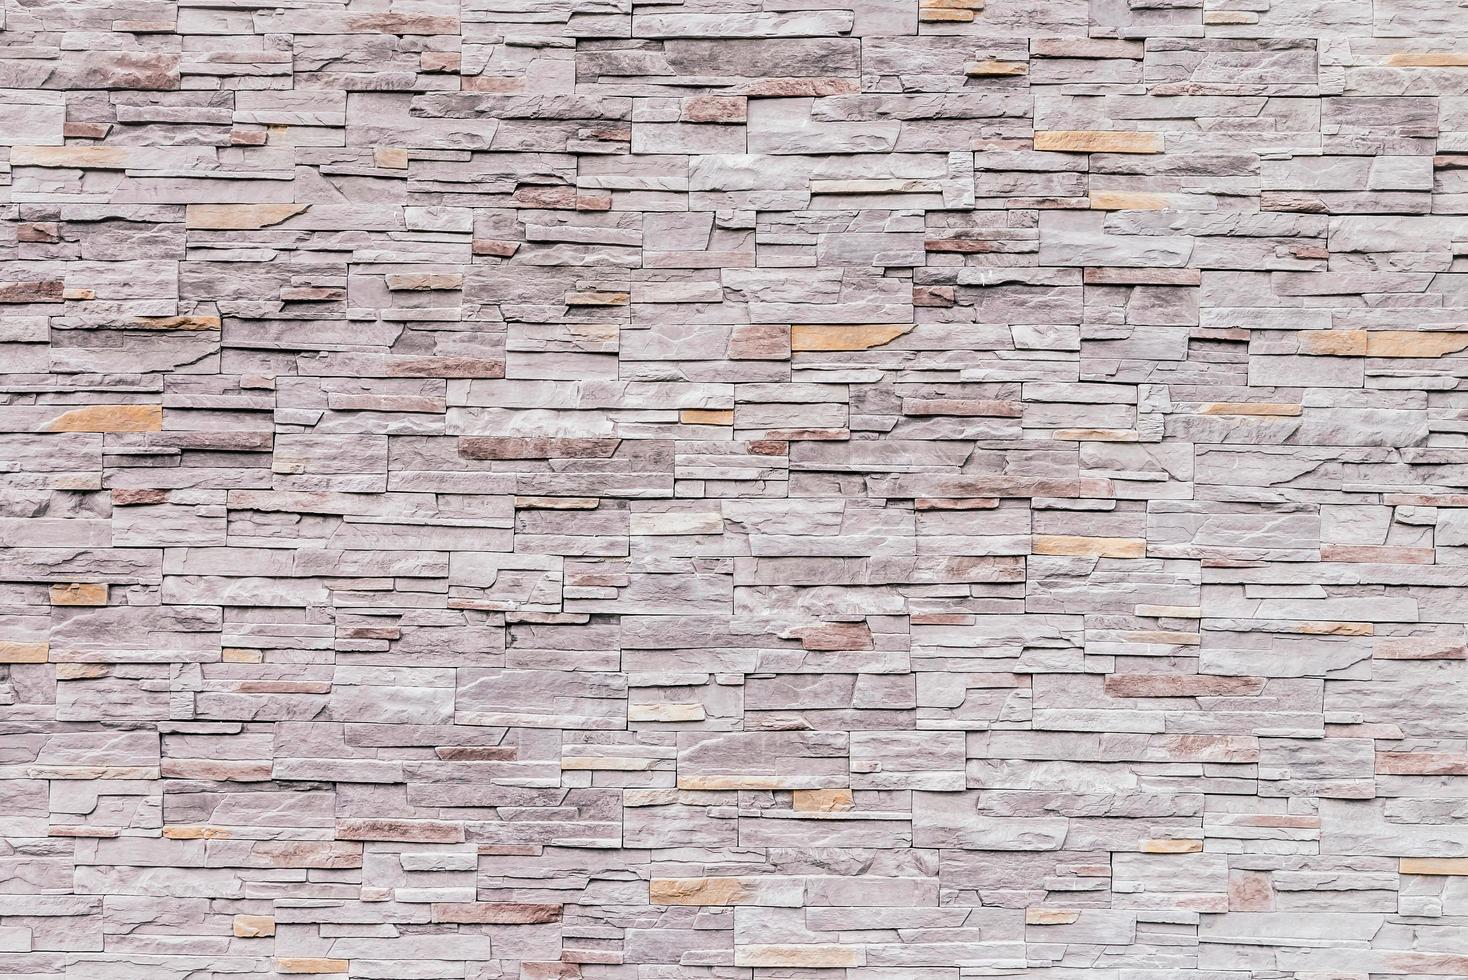 bakstenen muurtexturen foto